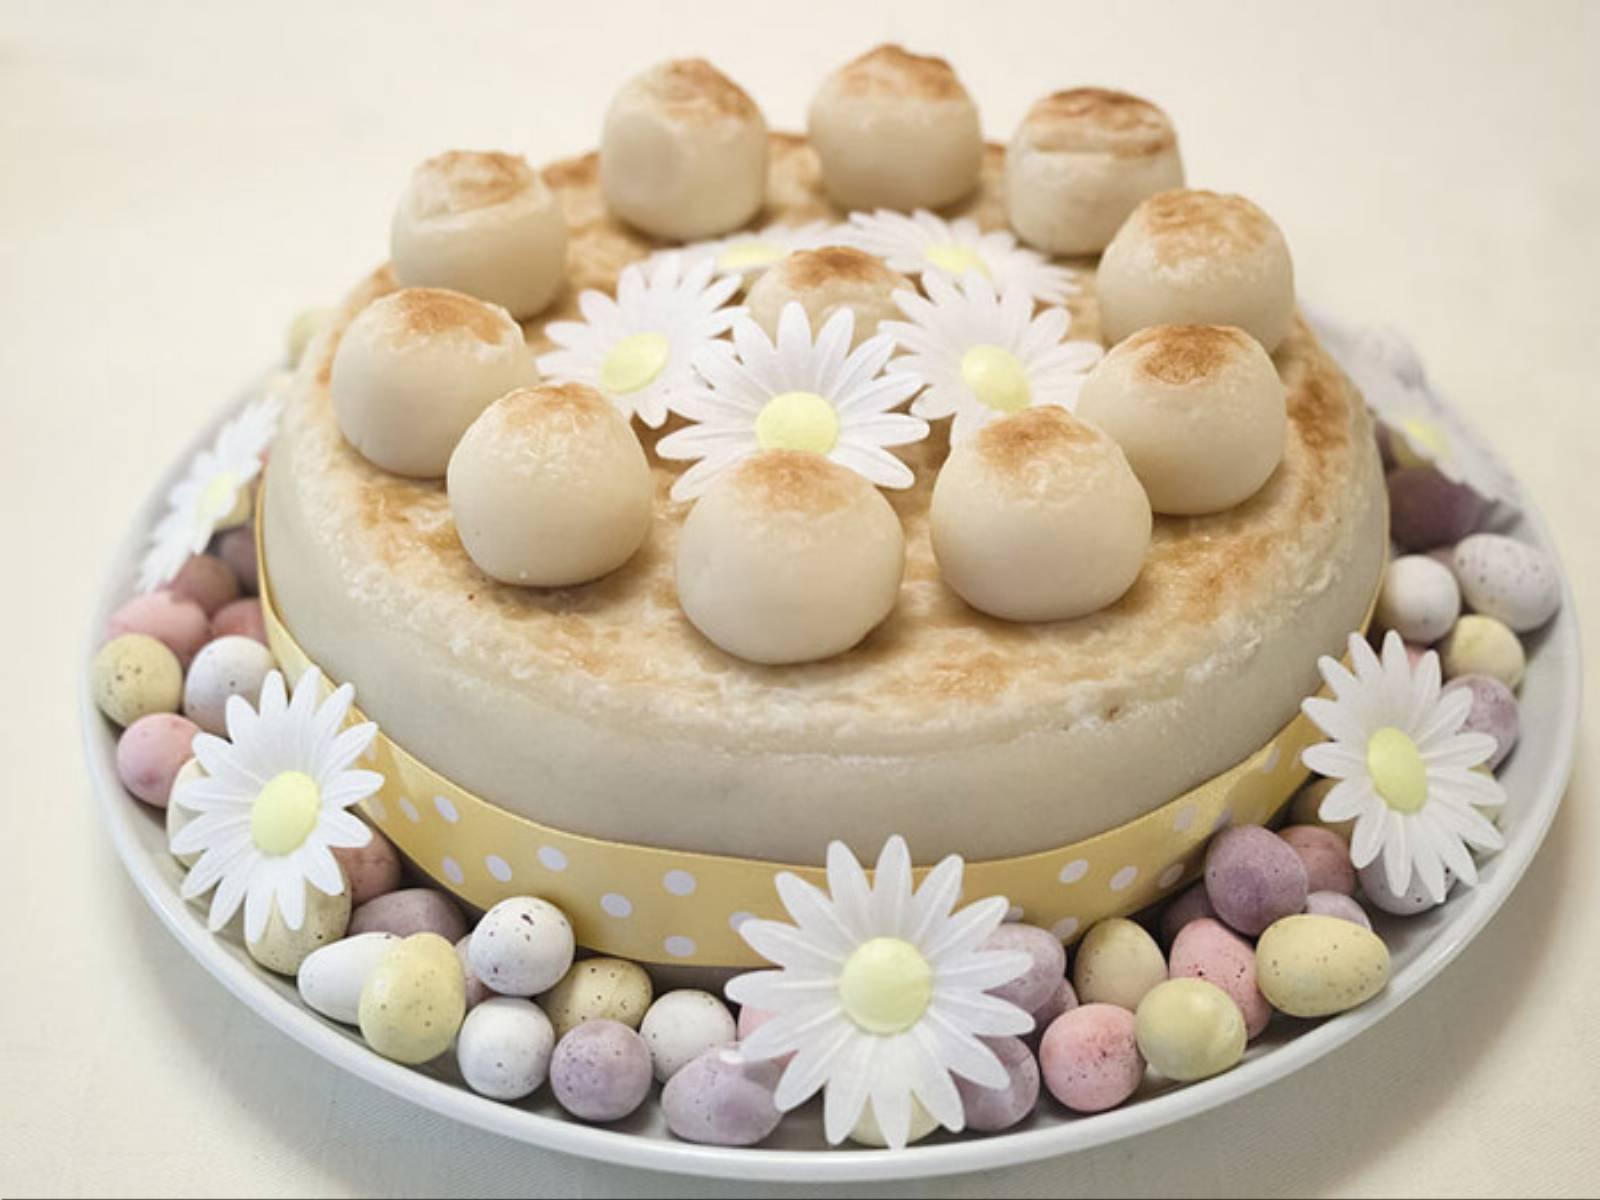 Decorated_Simnel_cake_(14173161143)